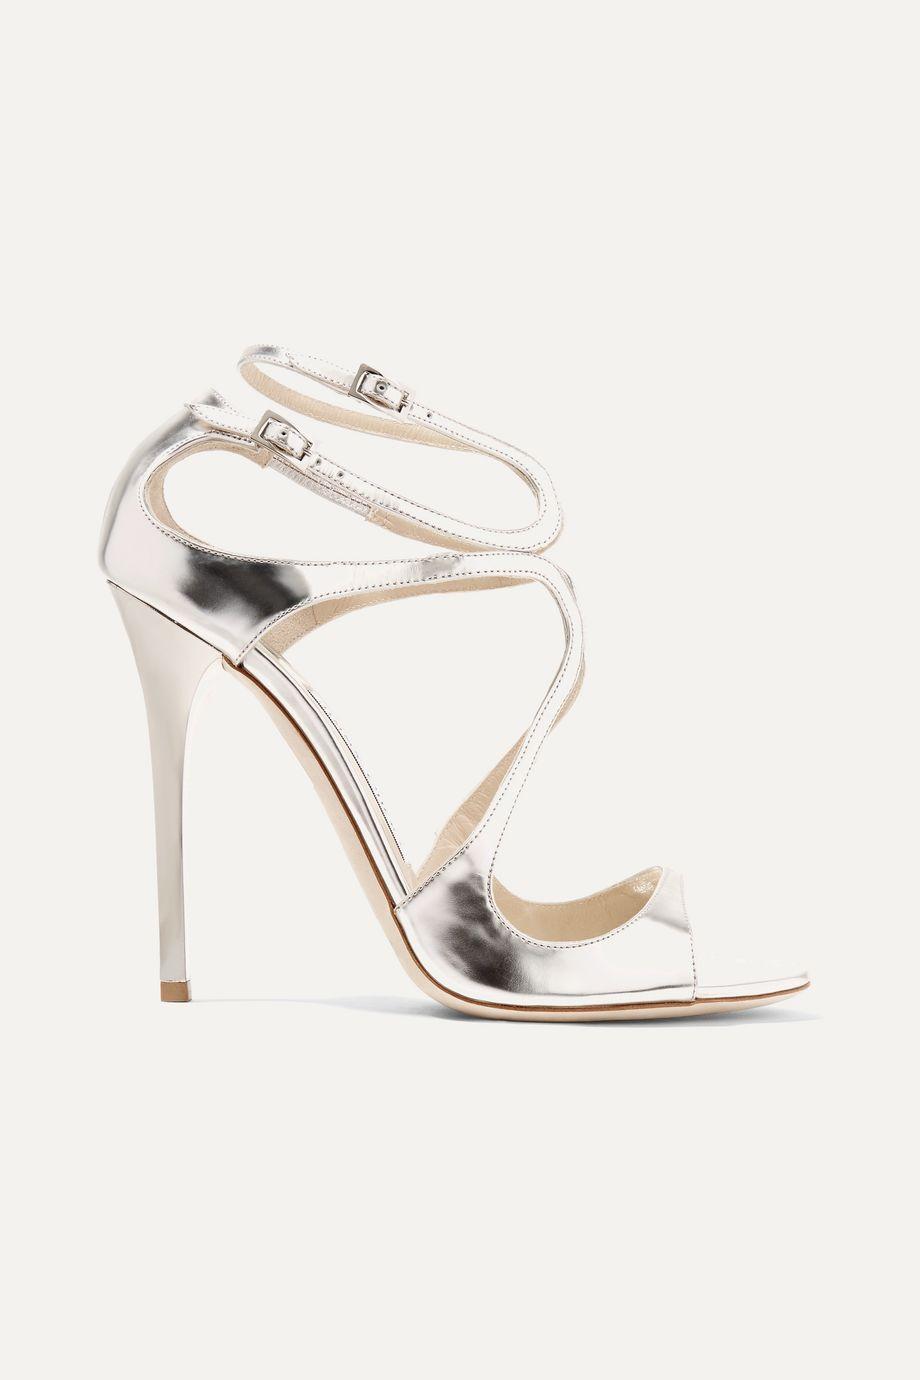 Jimmy Choo Lance 115 metallic leather sandals